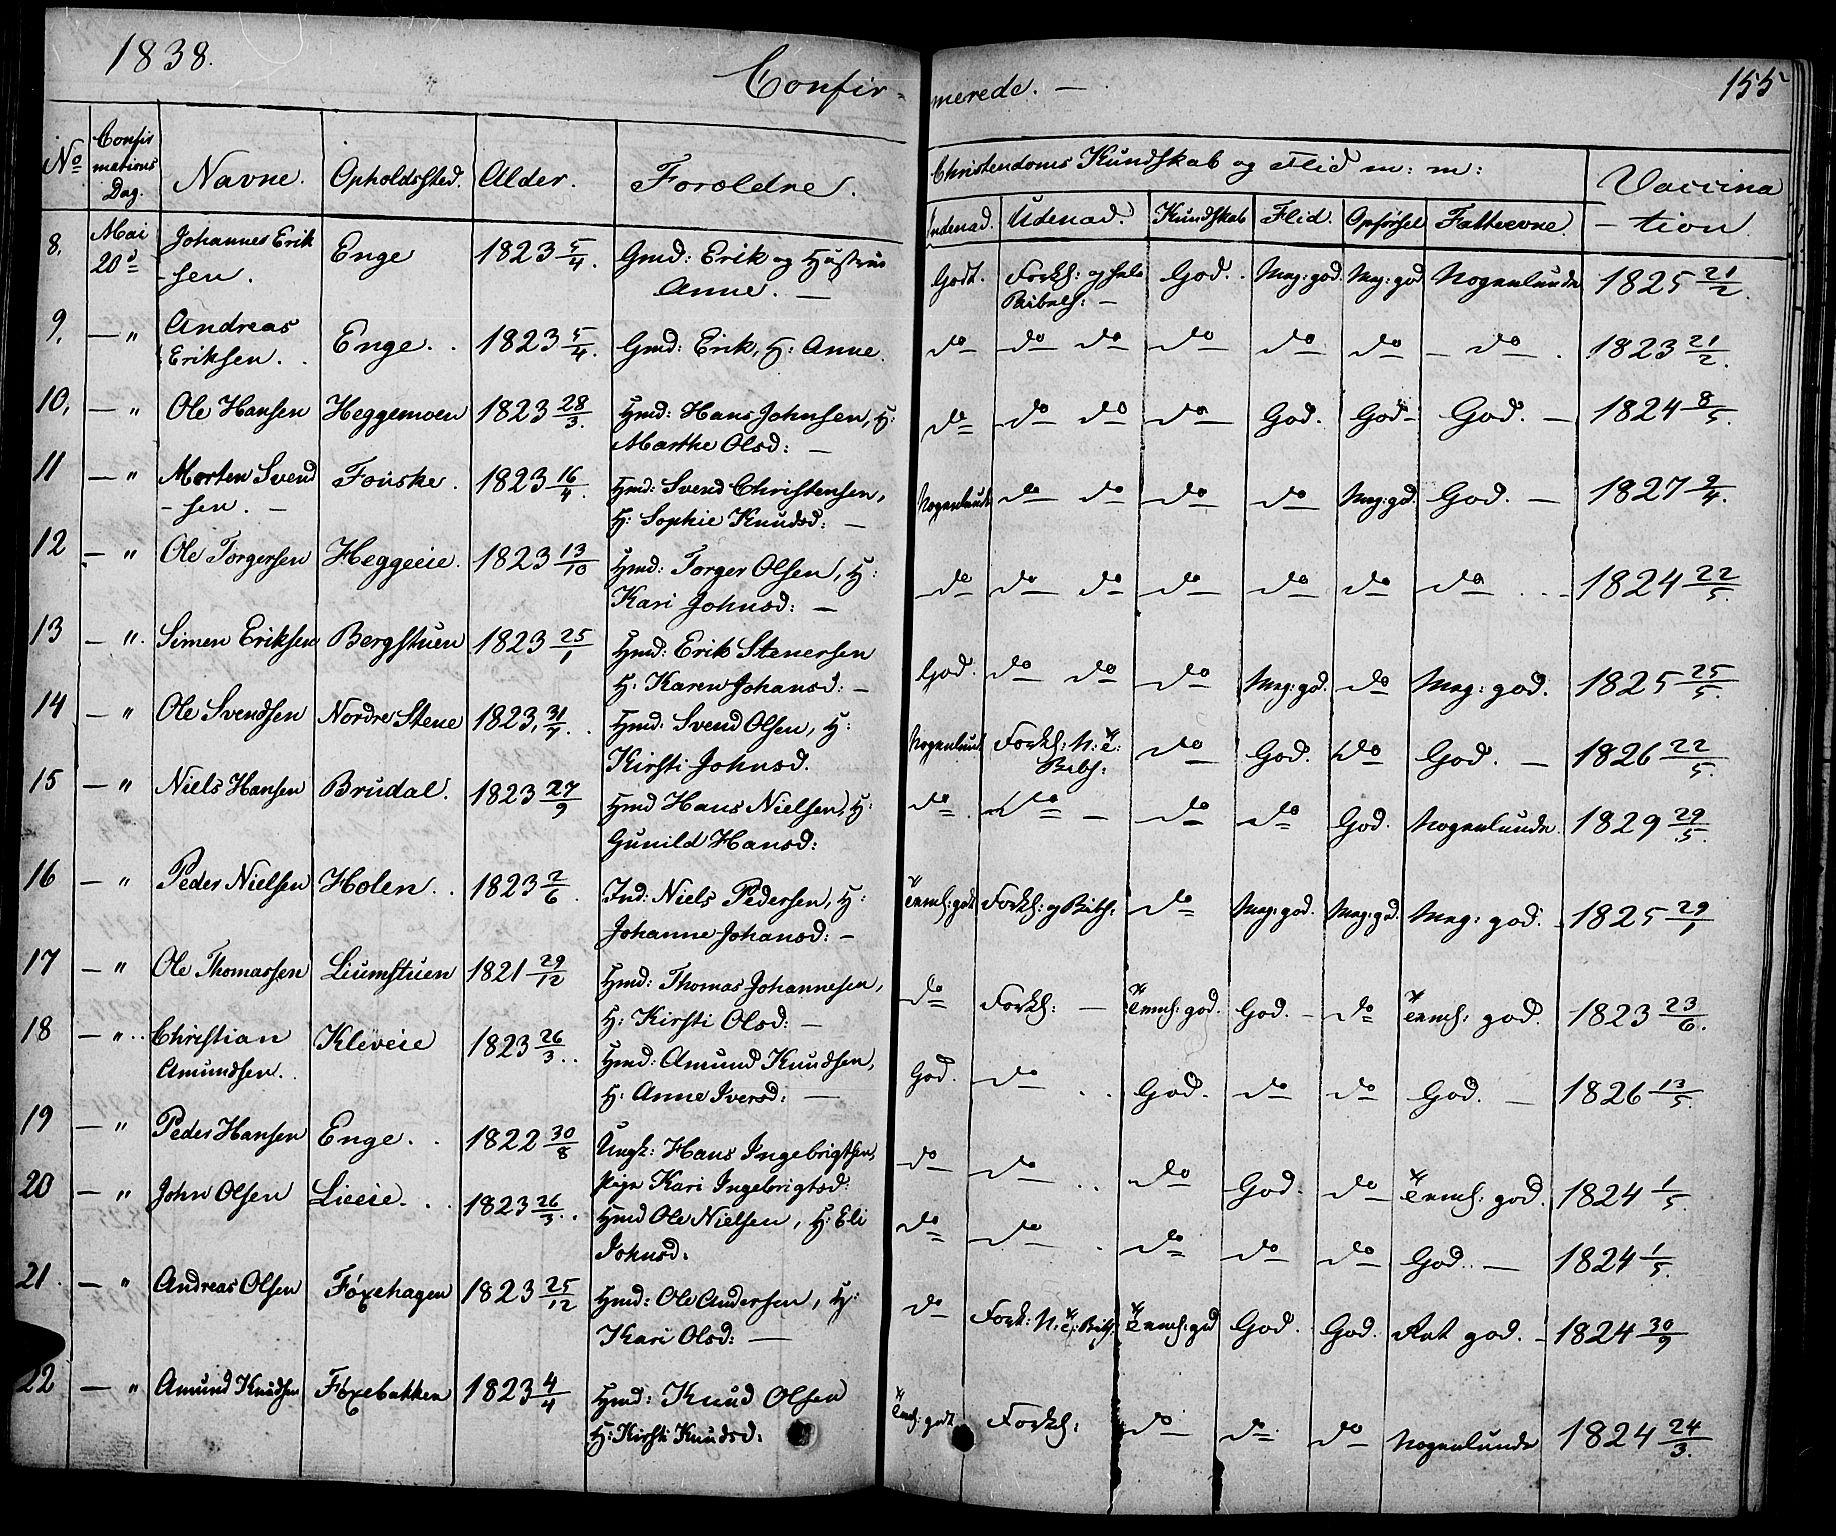 SAH, Gausdal prestekontor, Ministerialbok nr. 6, 1830-1839, s. 155